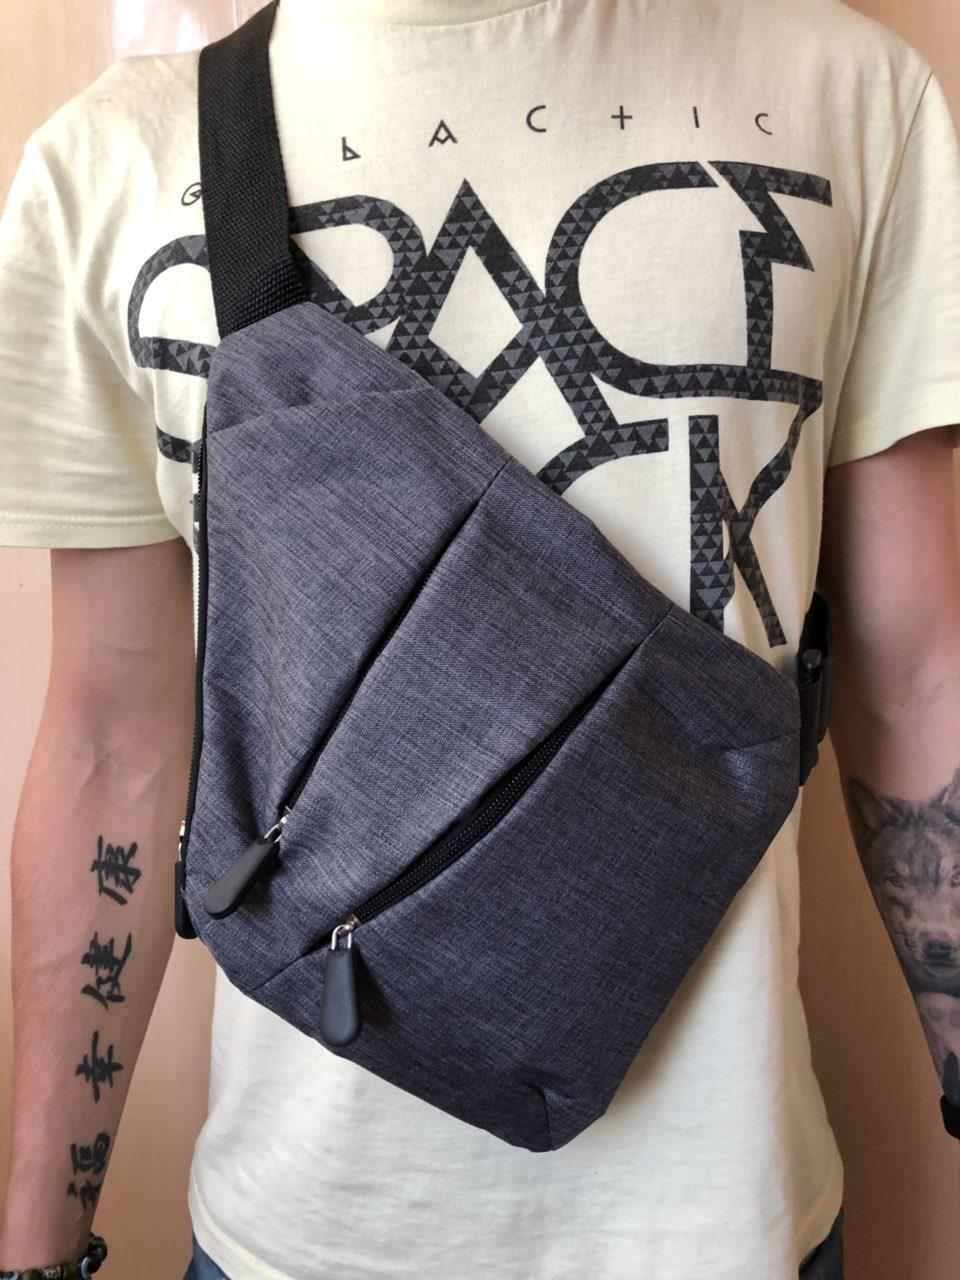 Мужская сумка мессенджер Cross Body, сумка через плече, рюкзак, слинг, сумка кобура, сумка крос боди